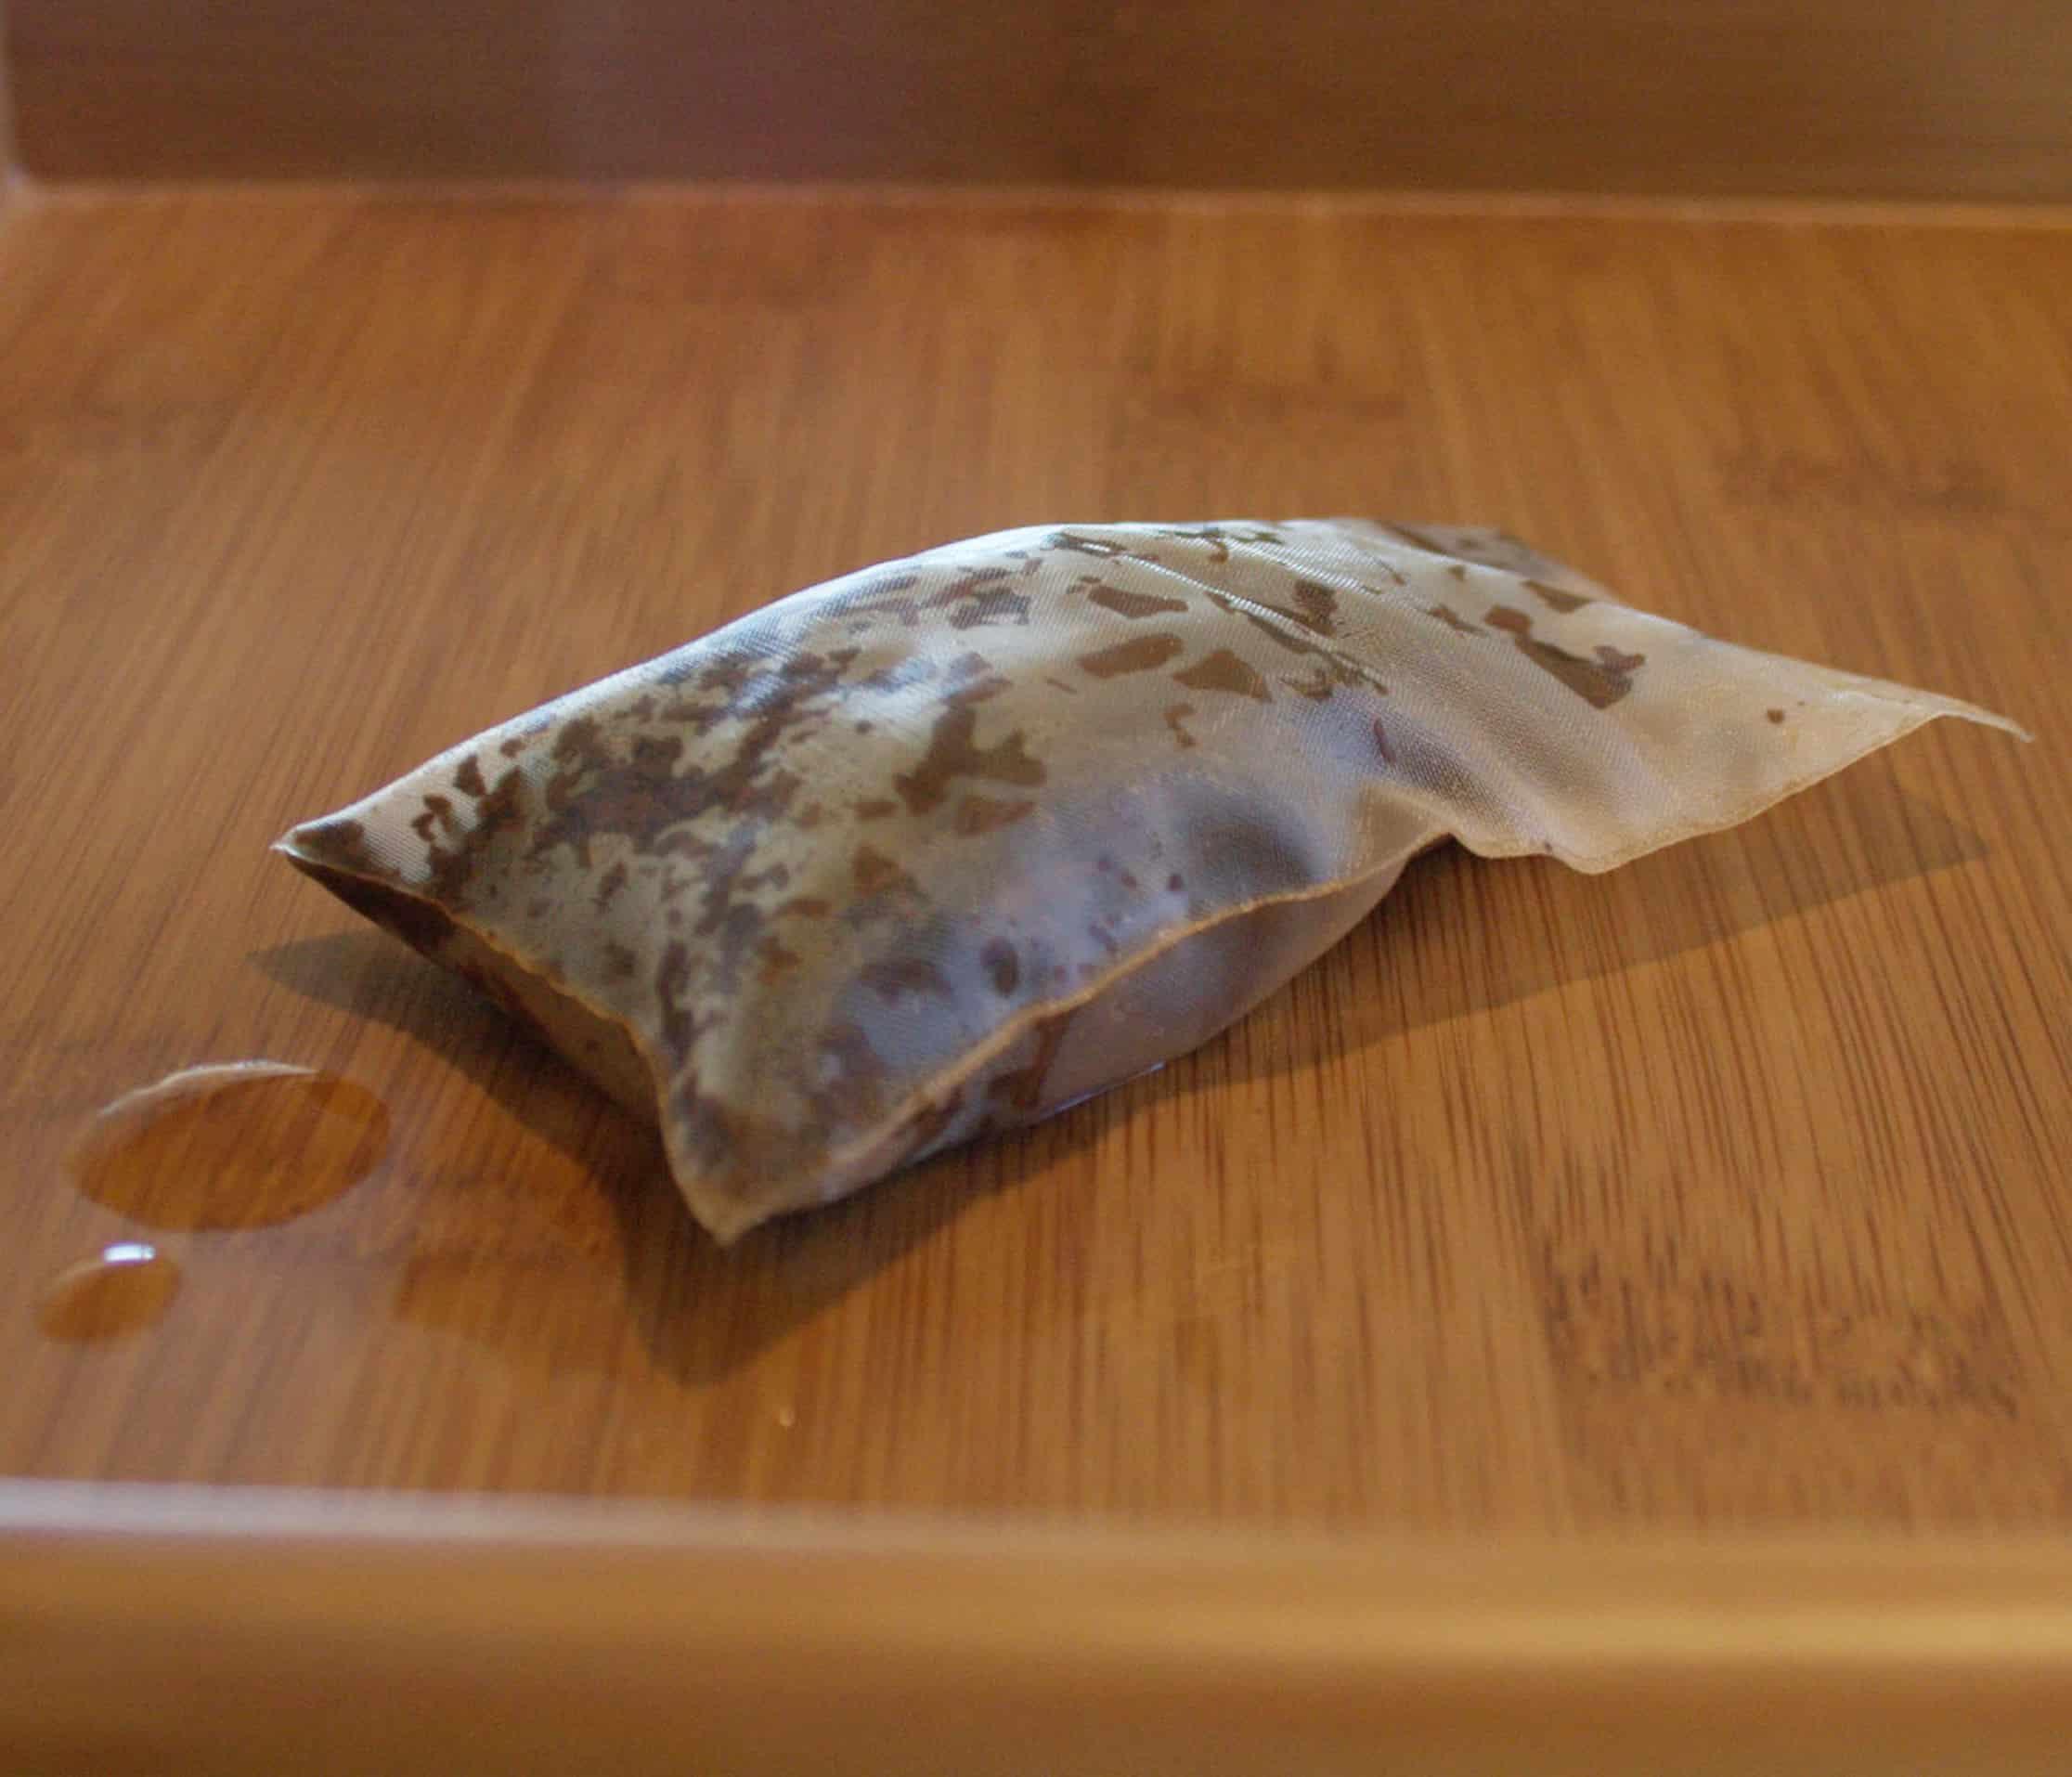 Same tea bag after steeping